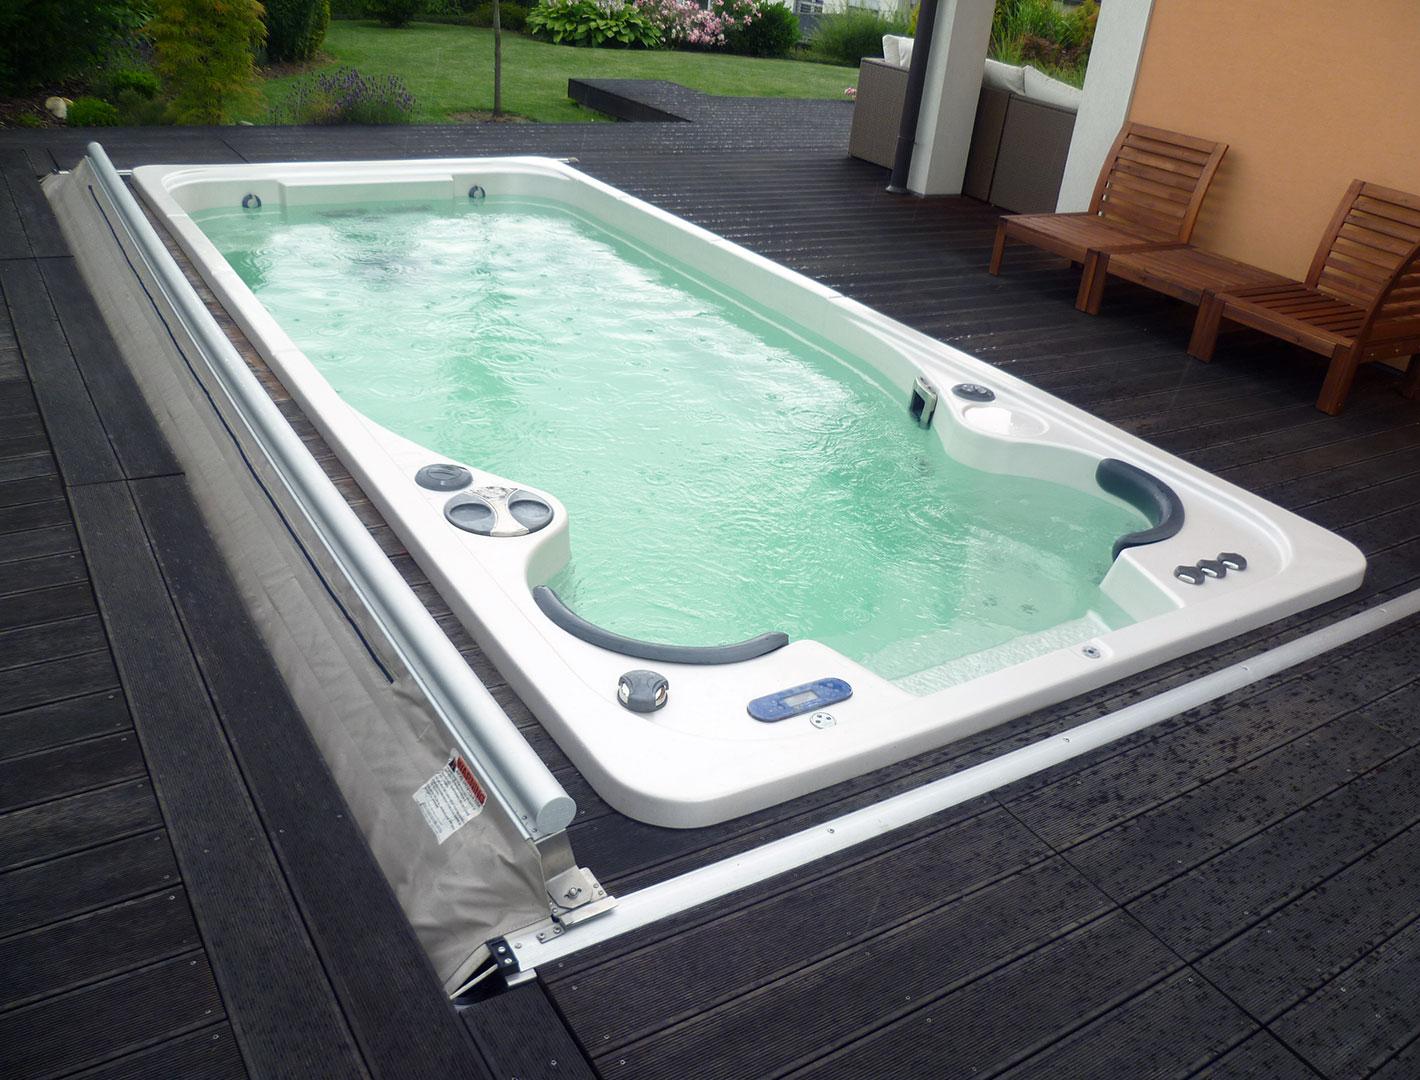 Zabudovaná vířivka Swim Spa do terasy - realizace Lípa